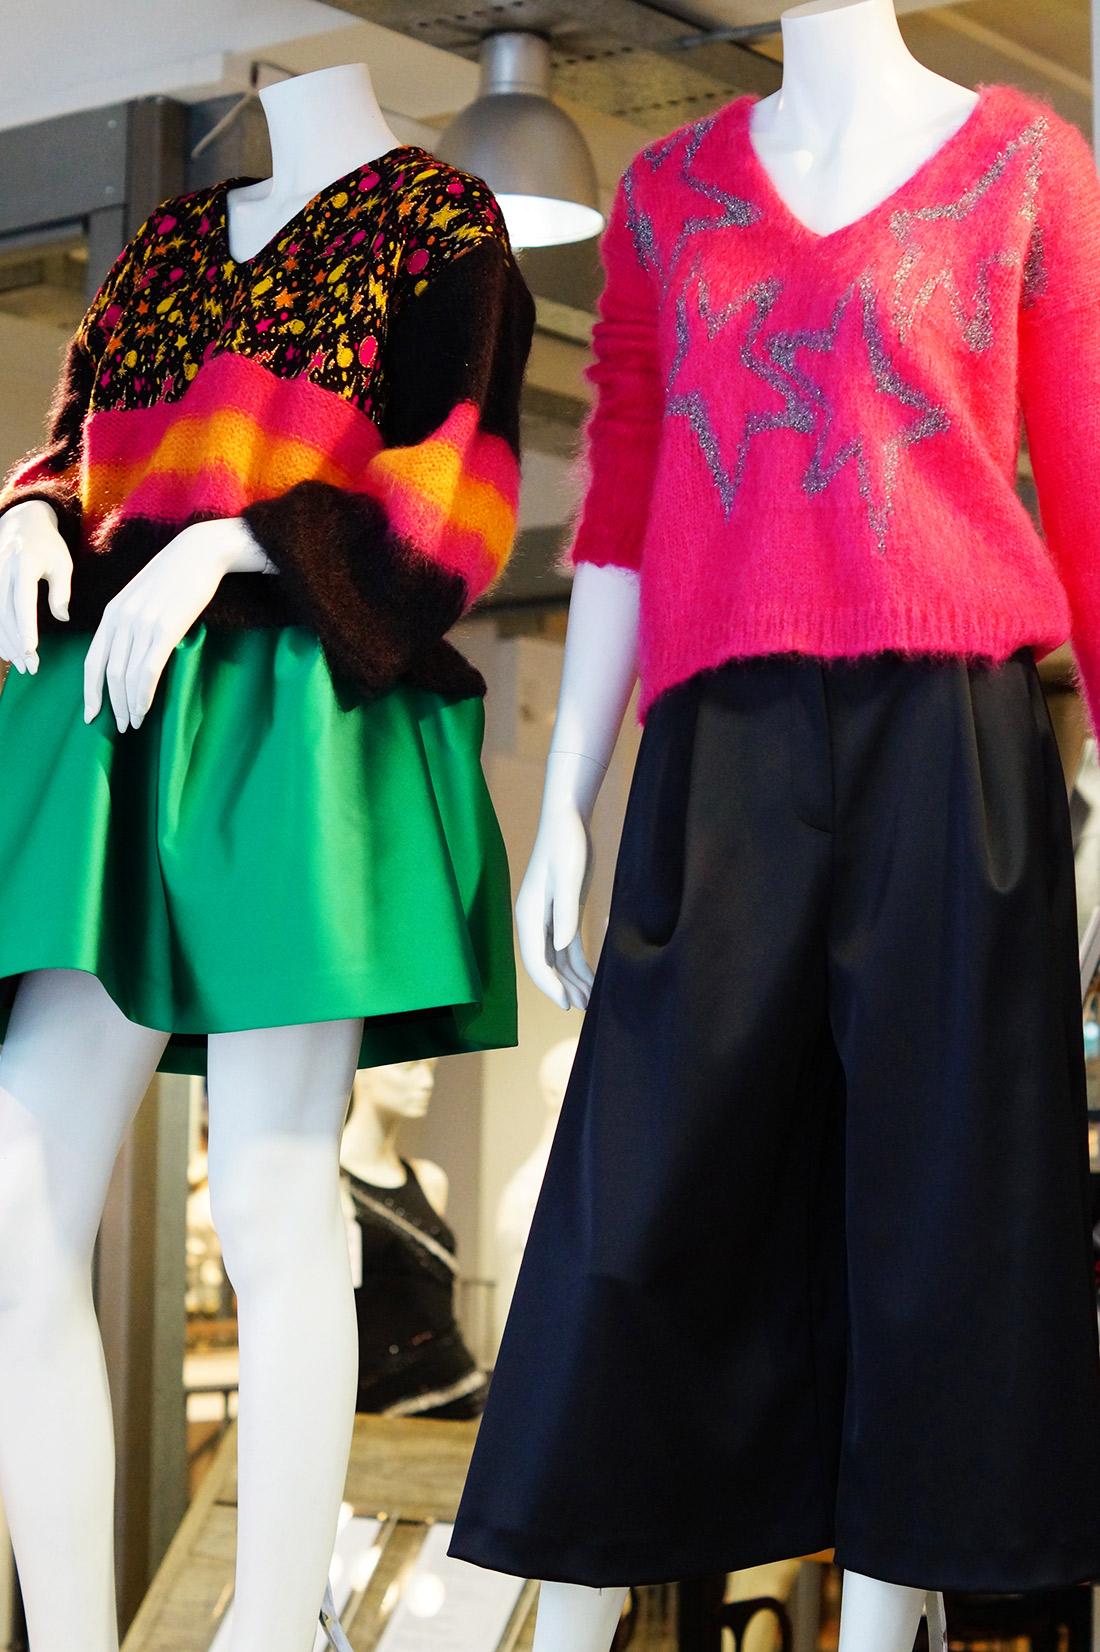 Bag-at-You---Fashion-blog---Hotspot-London-202-Bruch-and-shopping